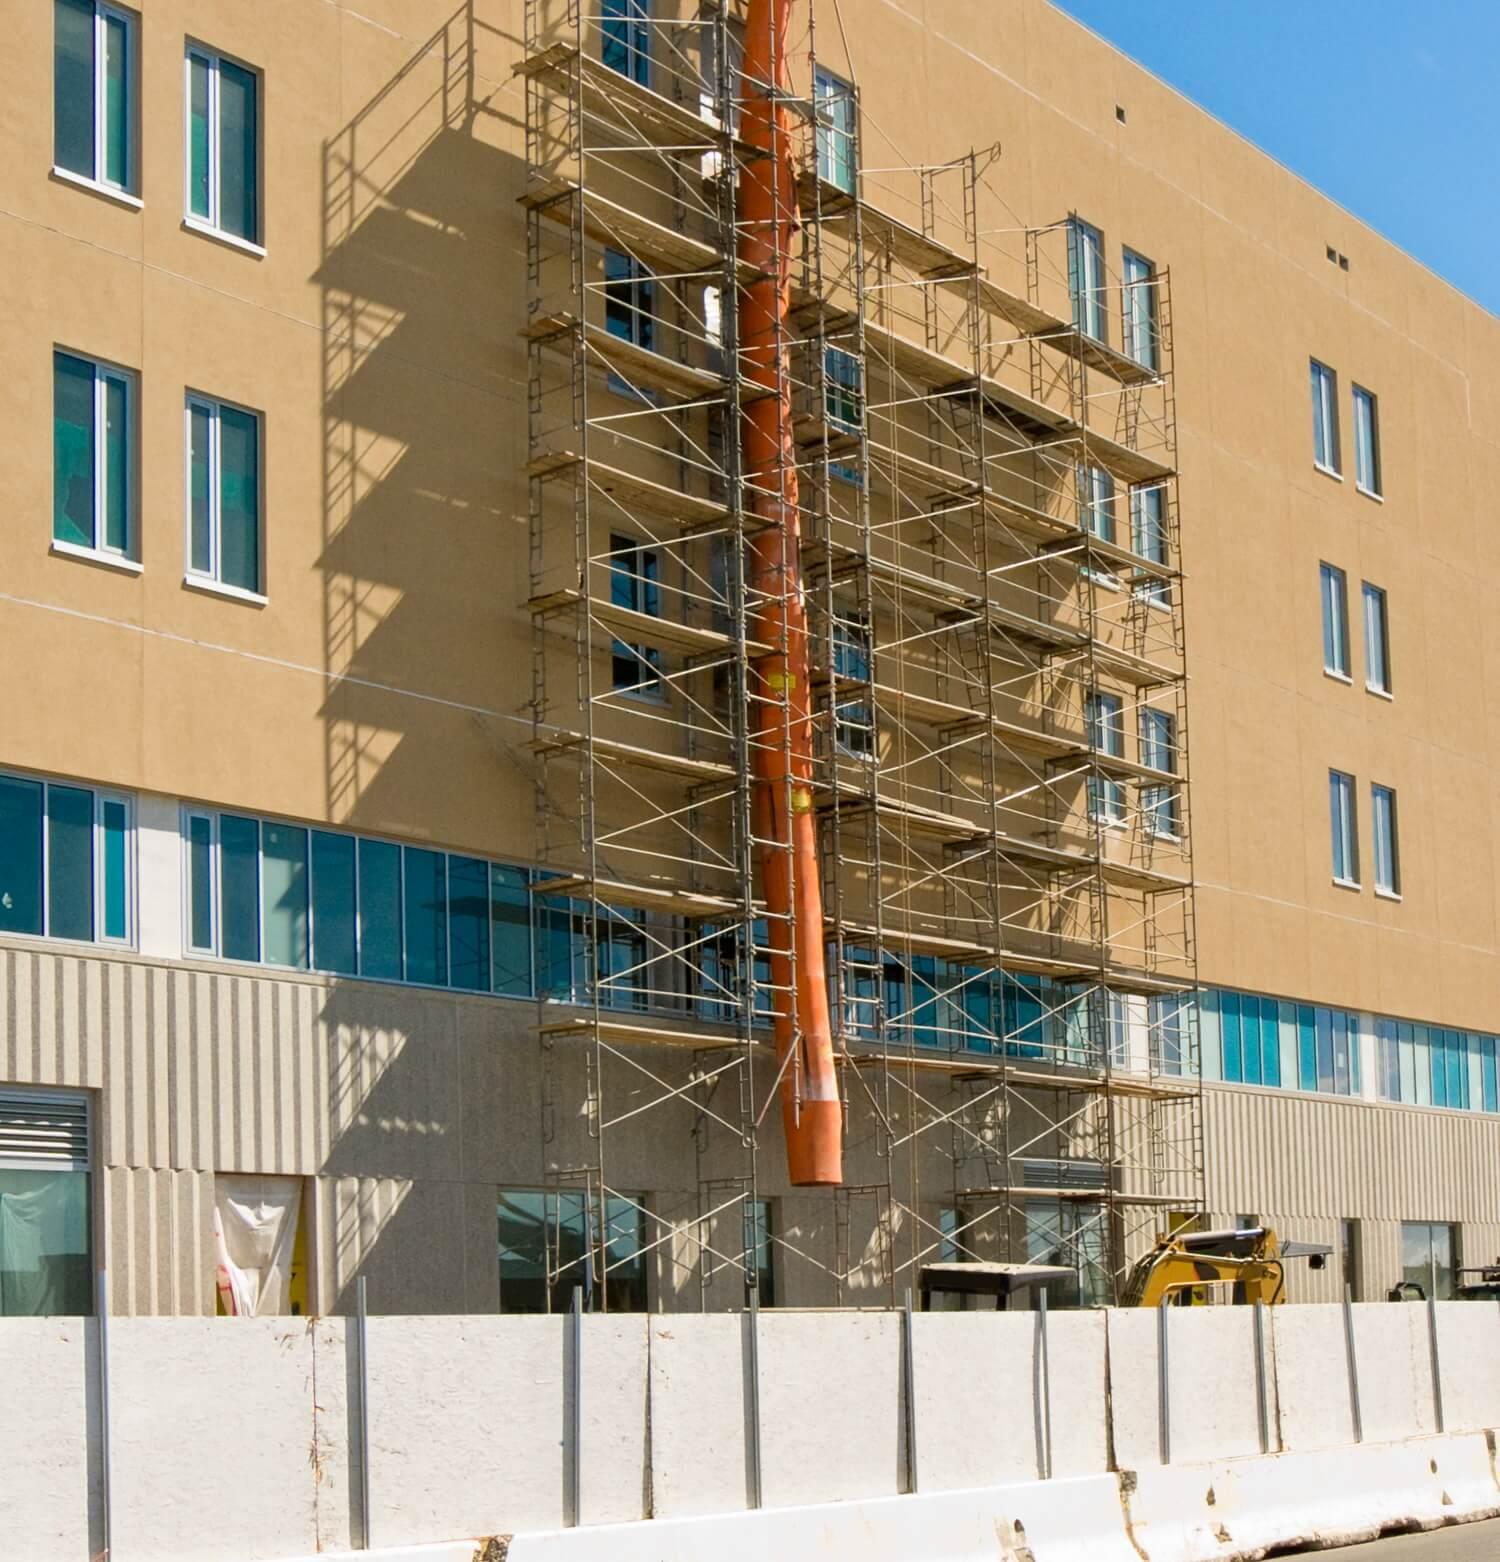 Hospital undergoing construction